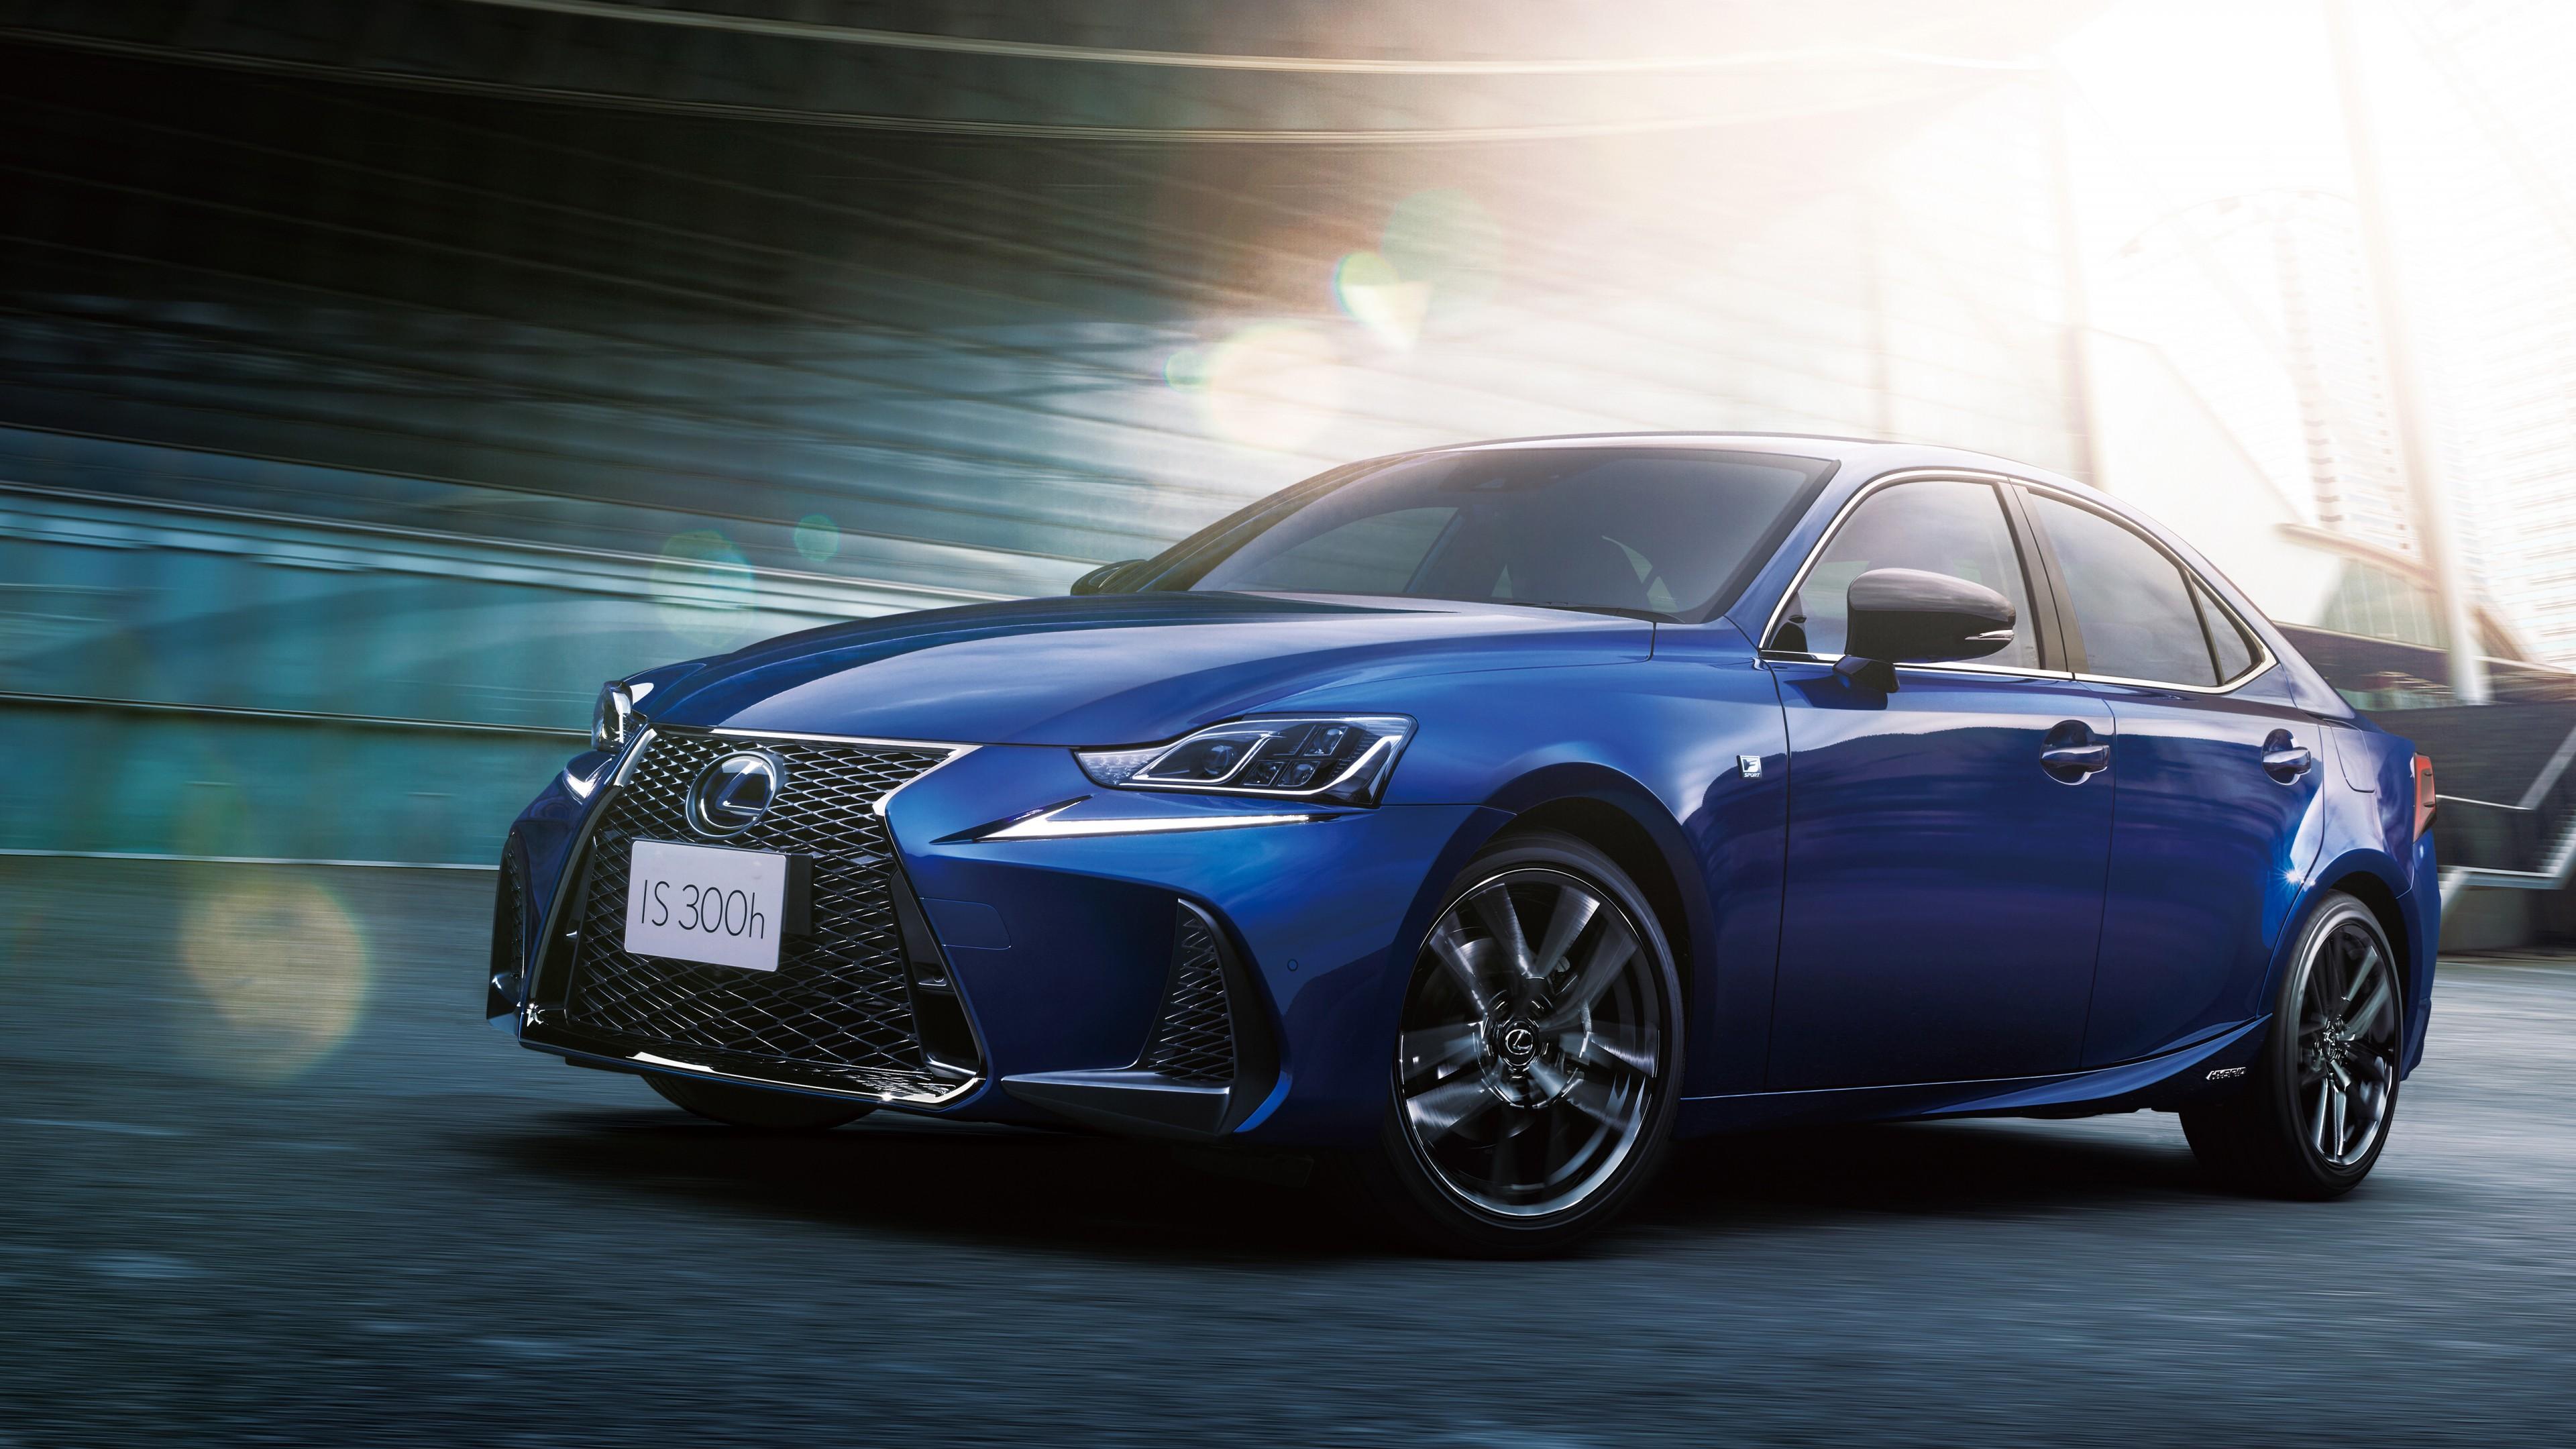 Lexus Is 300h F Sport I Blue 2019 4k Wallpaper Hd Car Wallpapers Id 13389